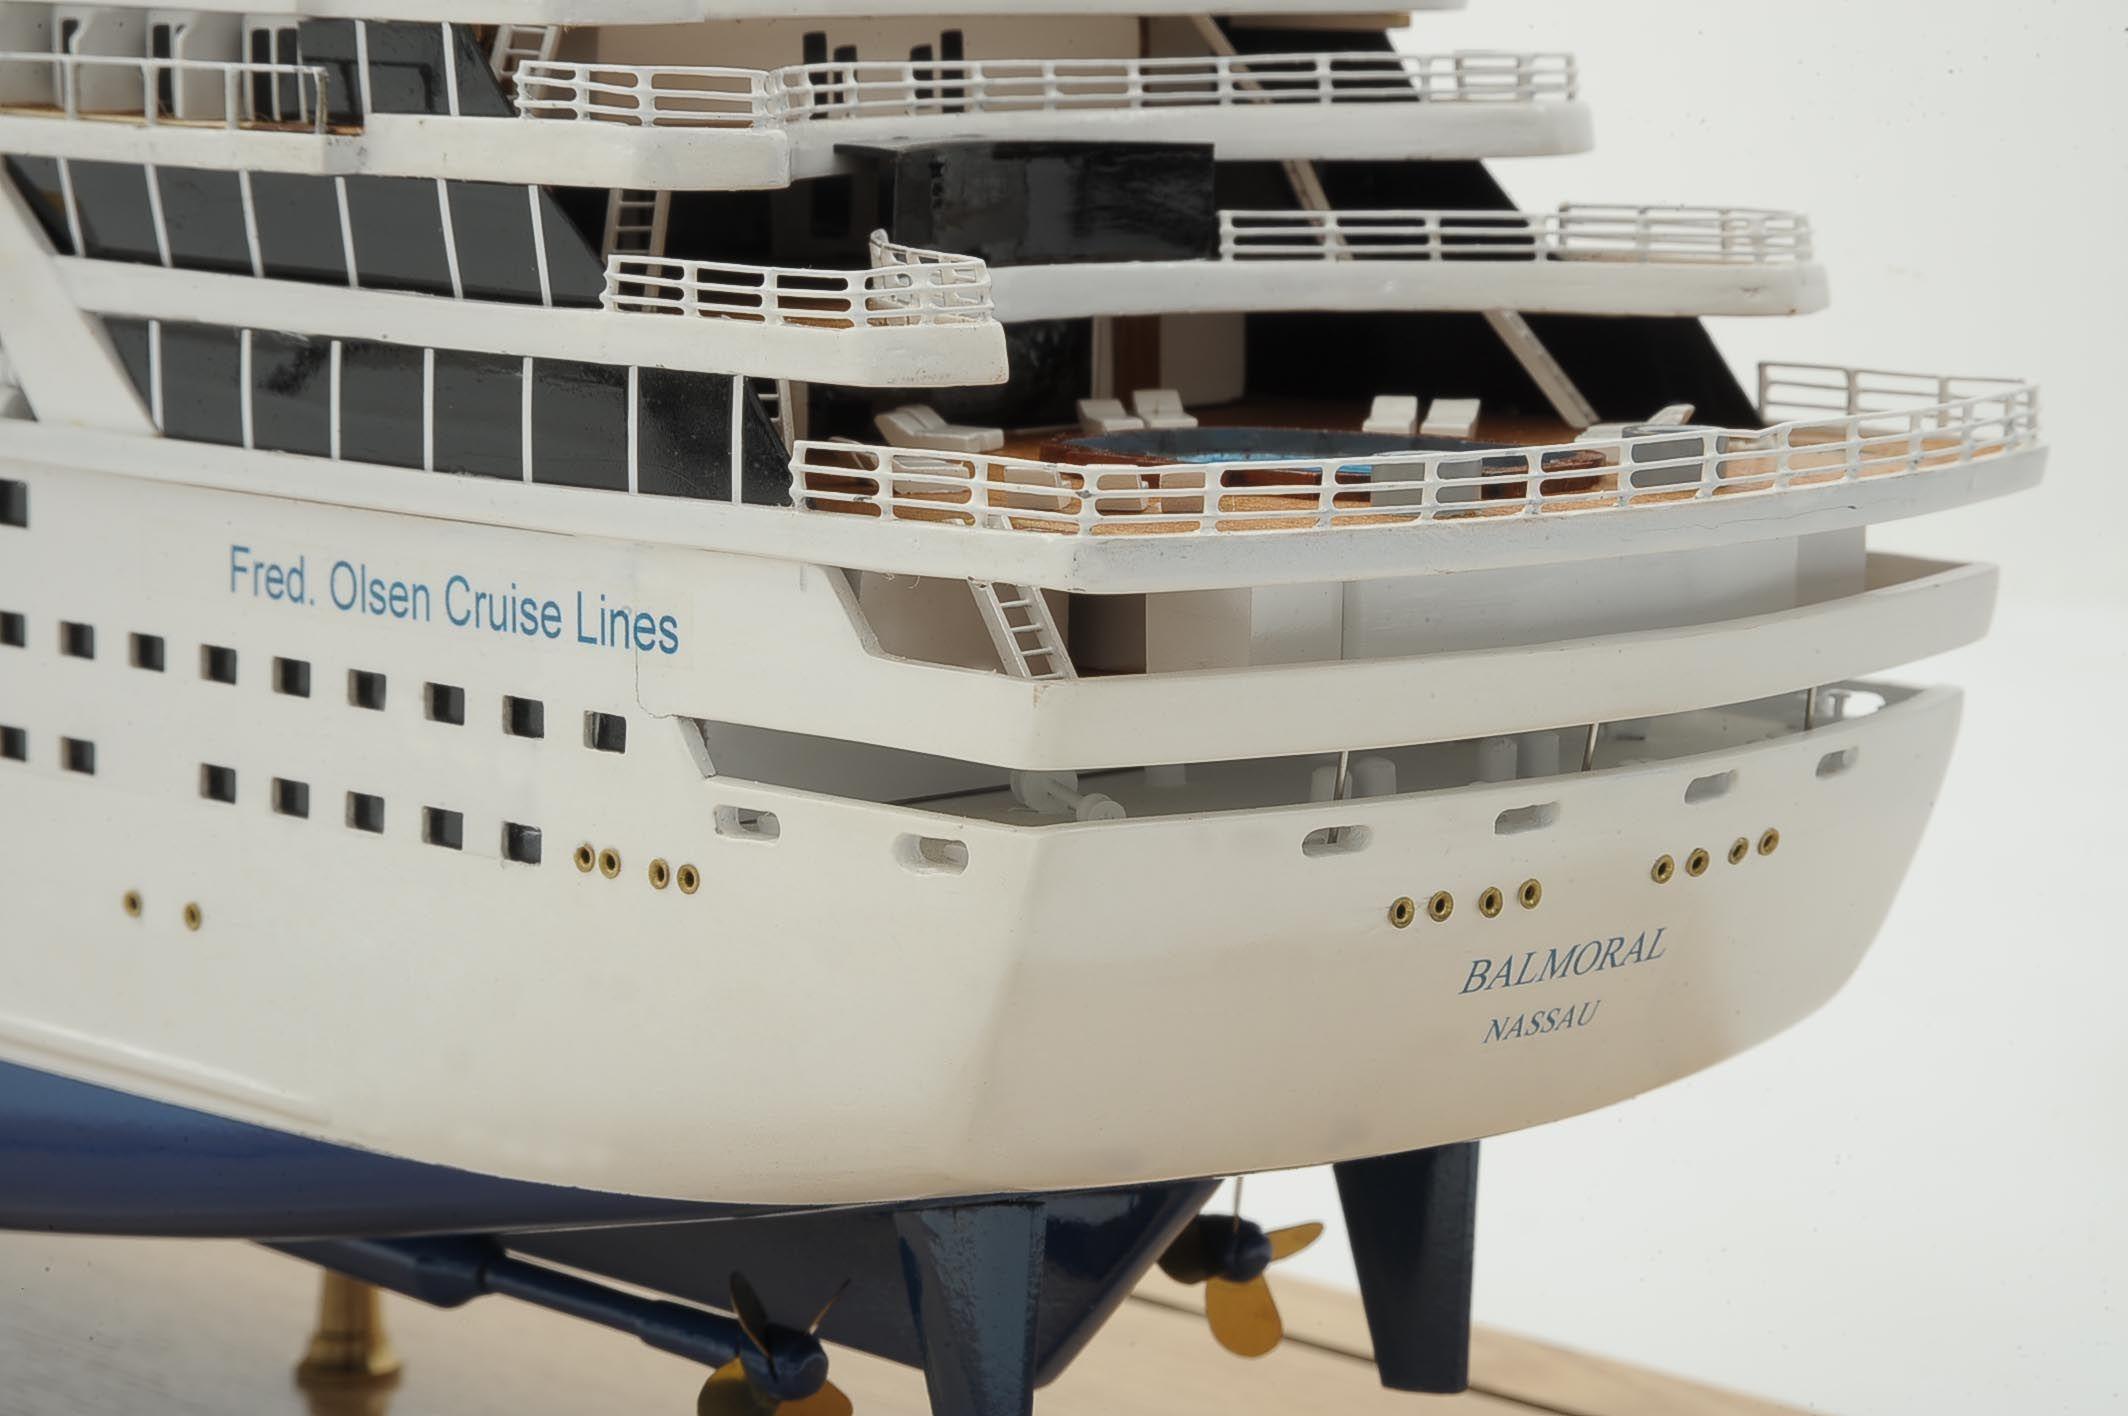 1292-6420-Balmoral-Cruise-Liner